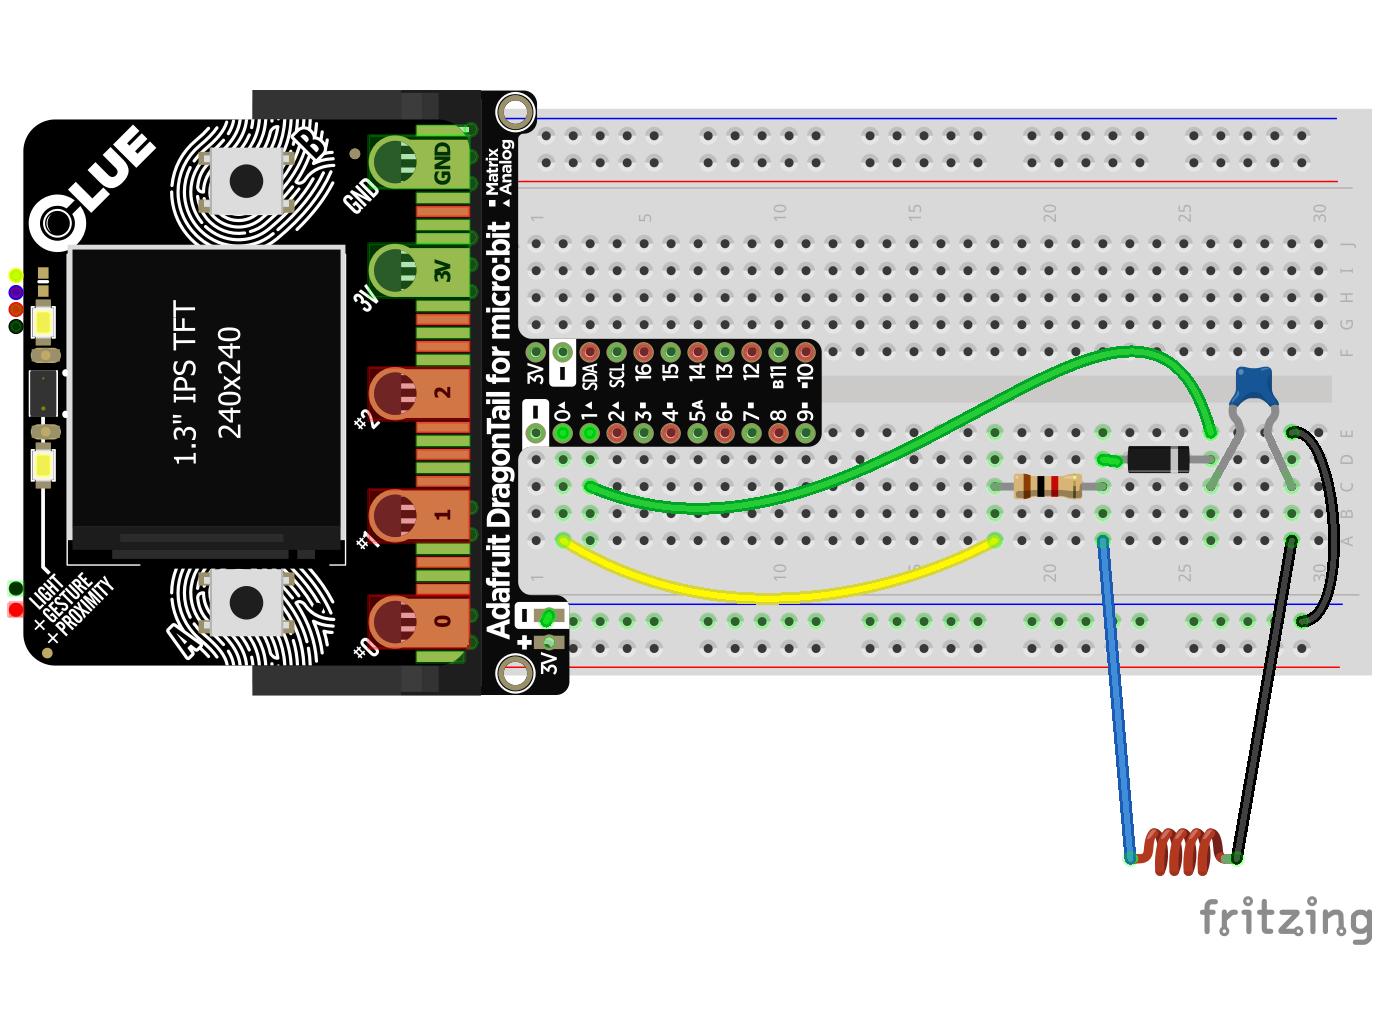 sensors_clue-metal-detector-v1_bb-43padded.png